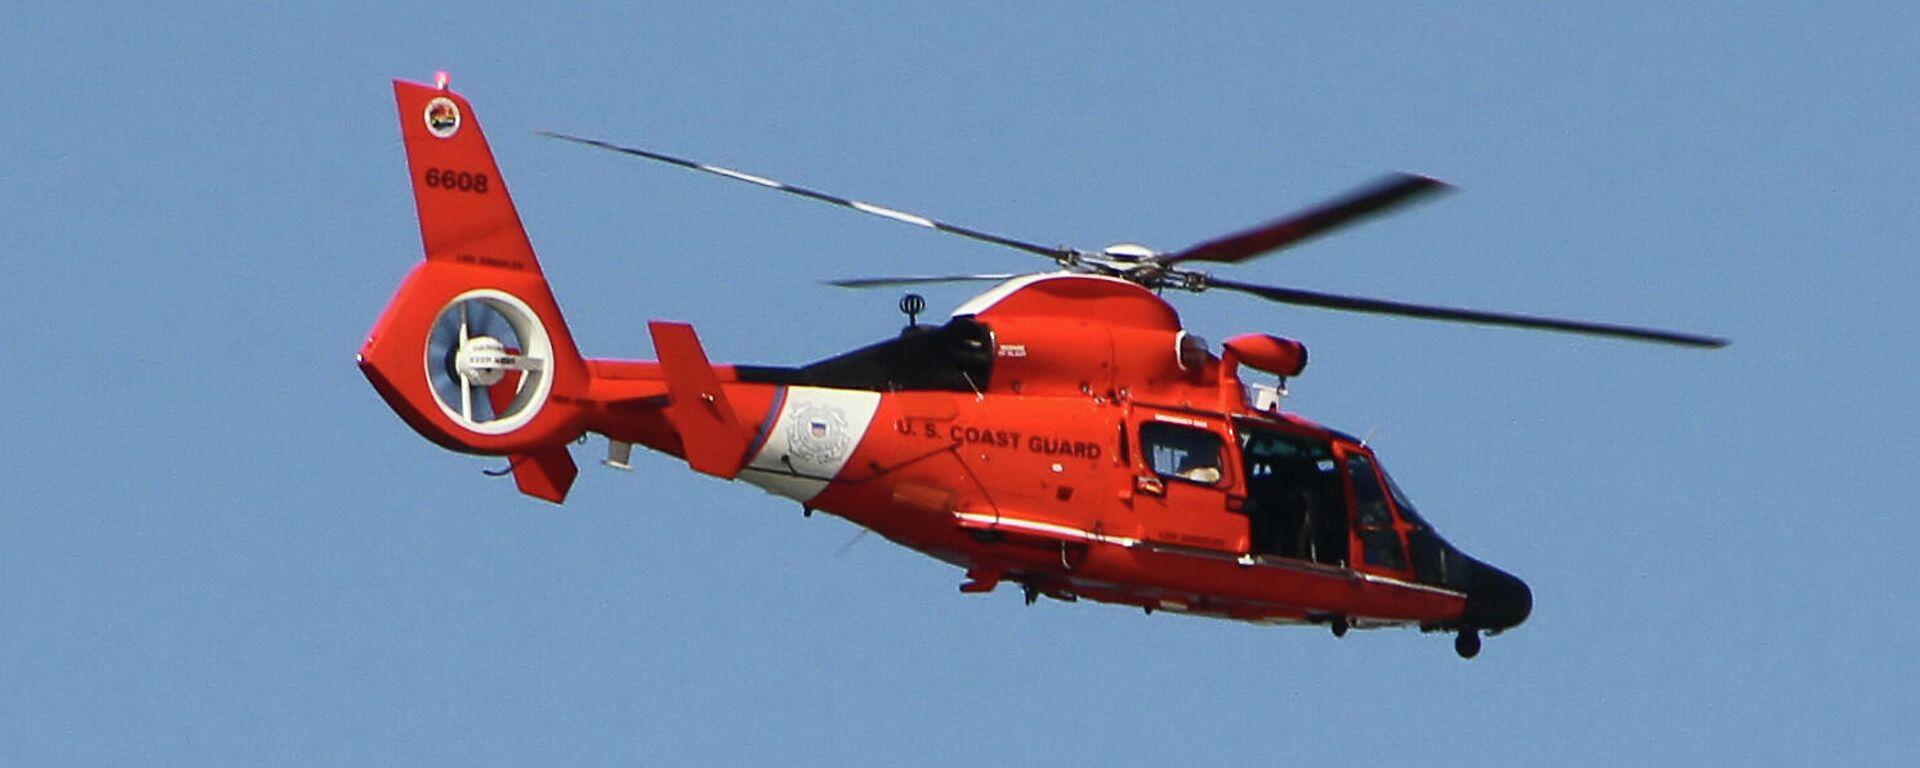 Un helicóptero de rescate de la Guardia Costera de EEUU - Sputnik Mundo, 1920, 03.07.2021